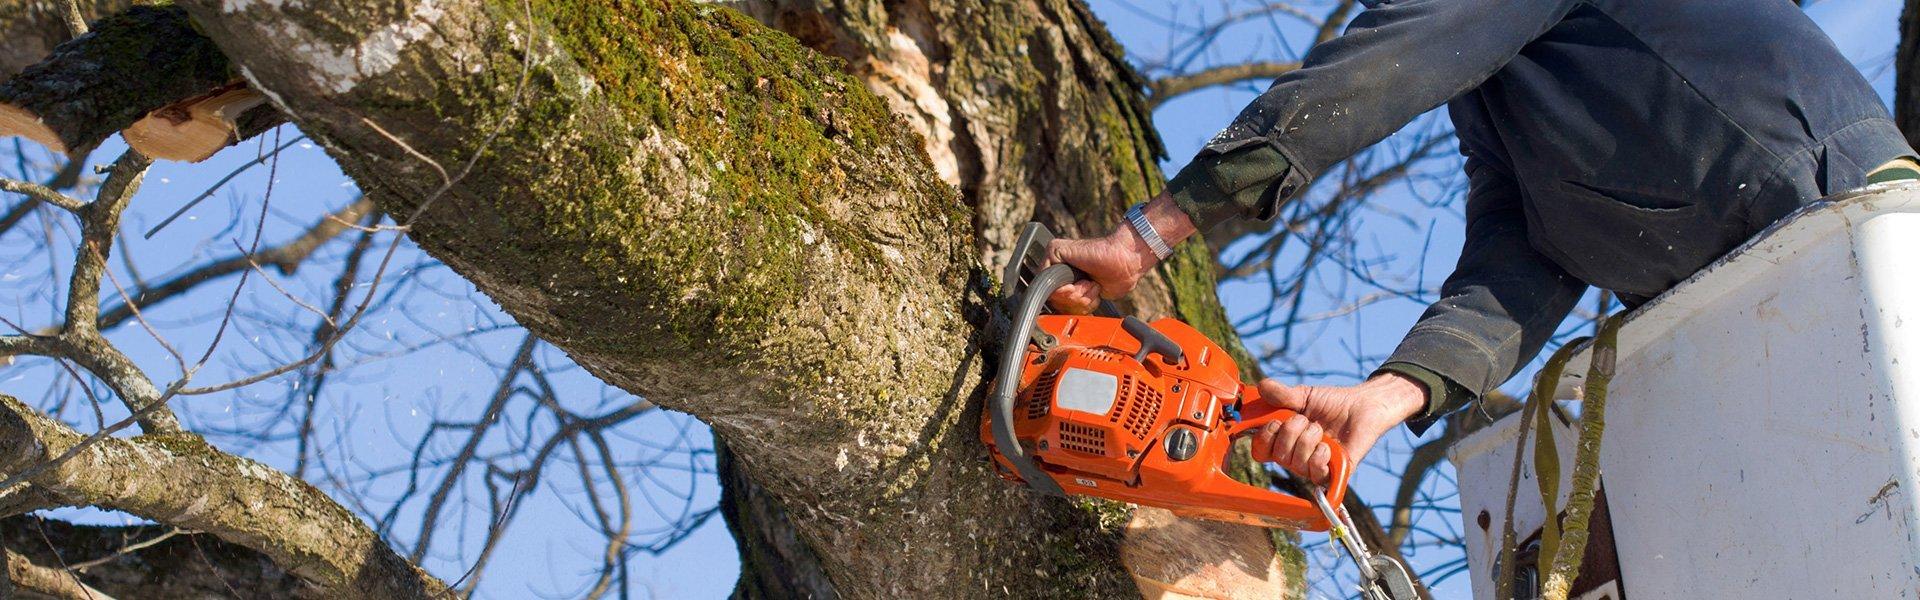 Tree Srvice